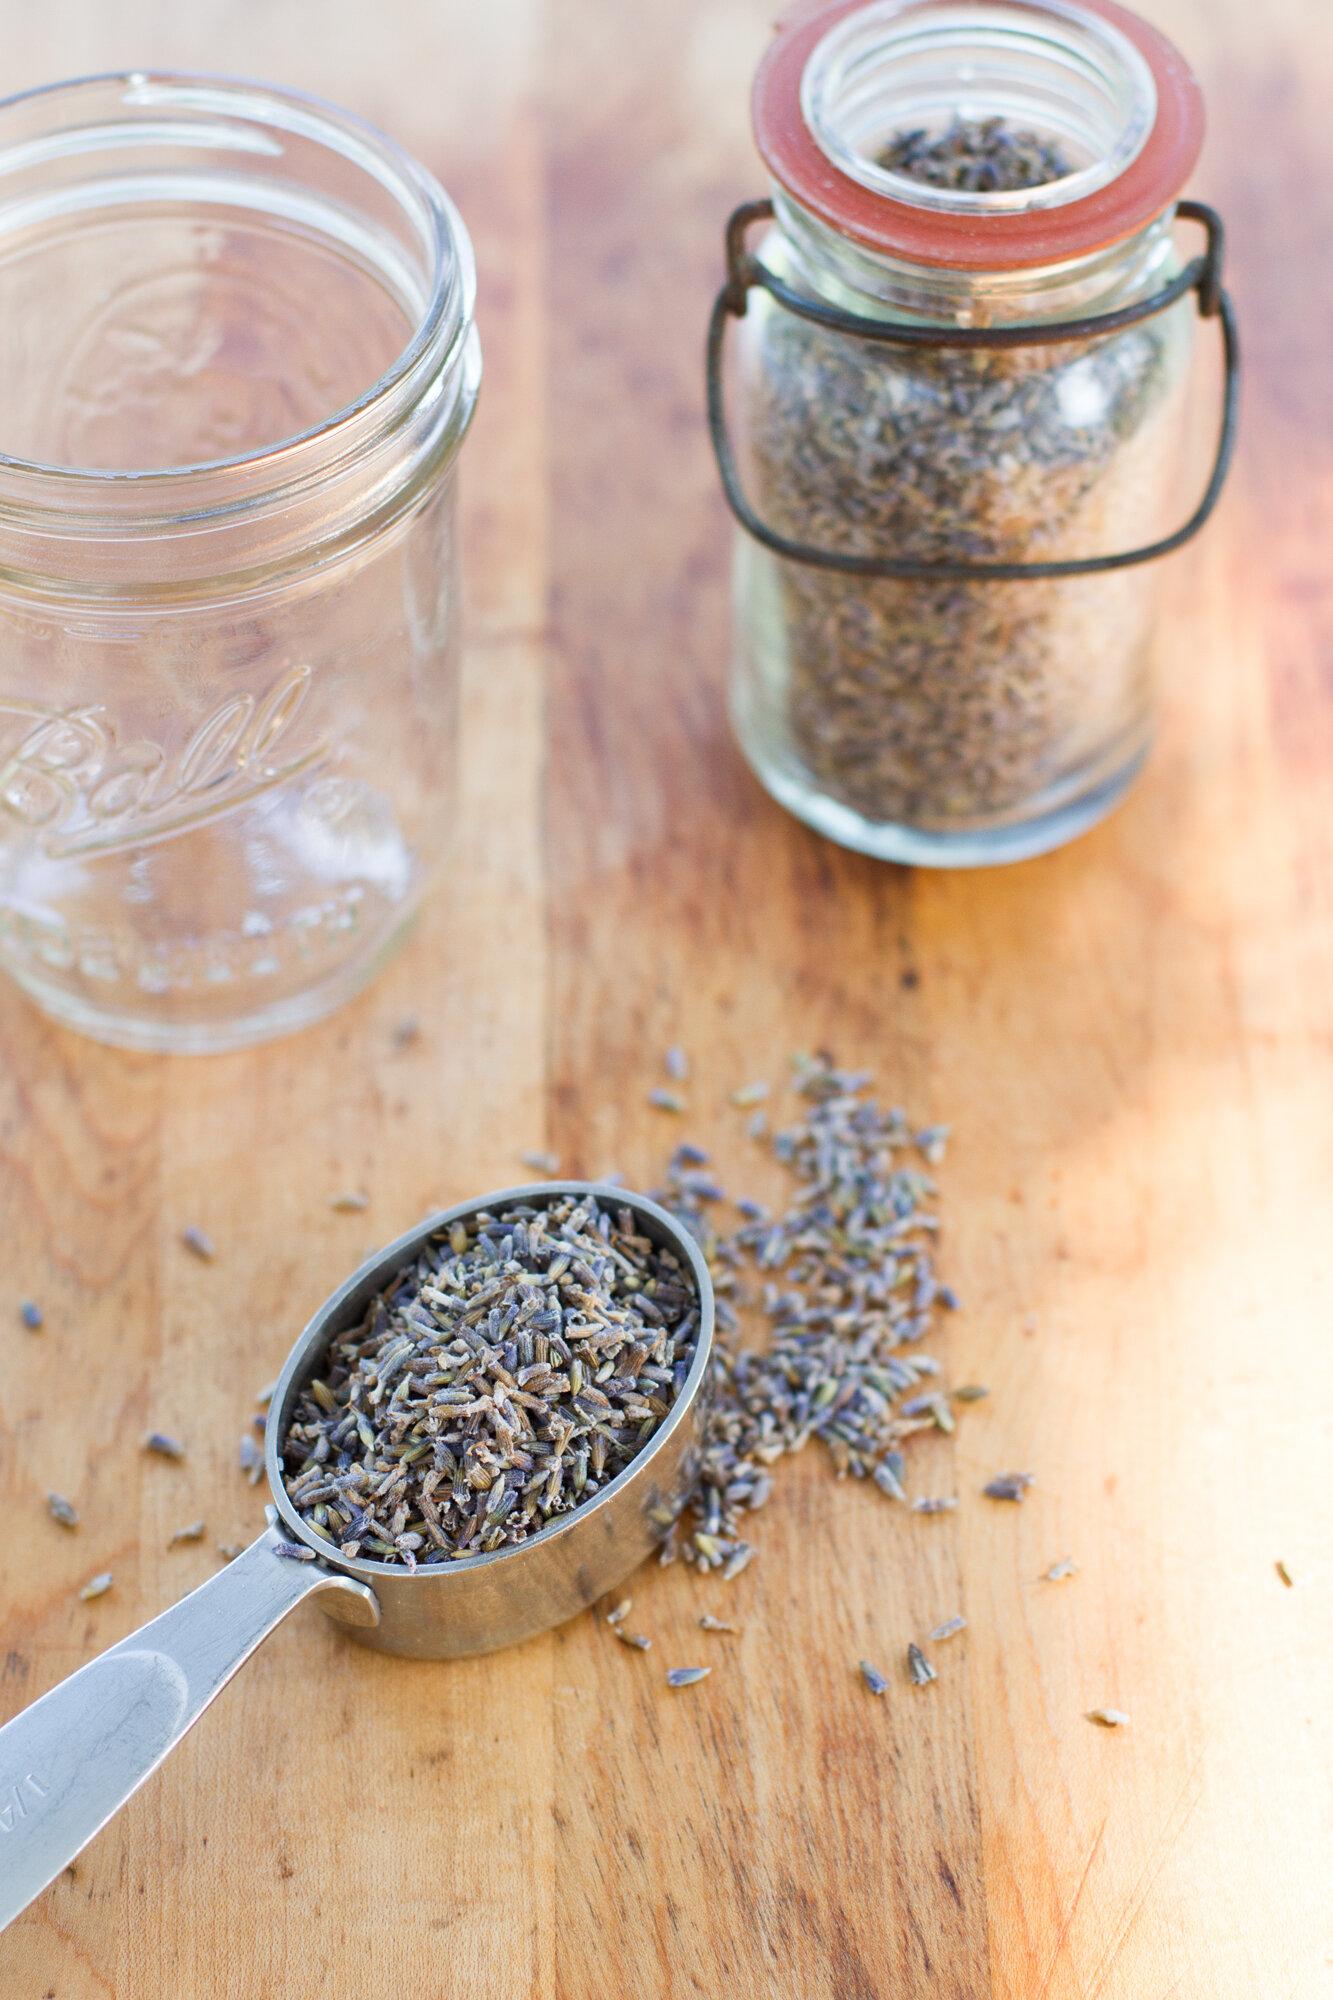 lavender vinegar cleaning spray | reading my tea leaves